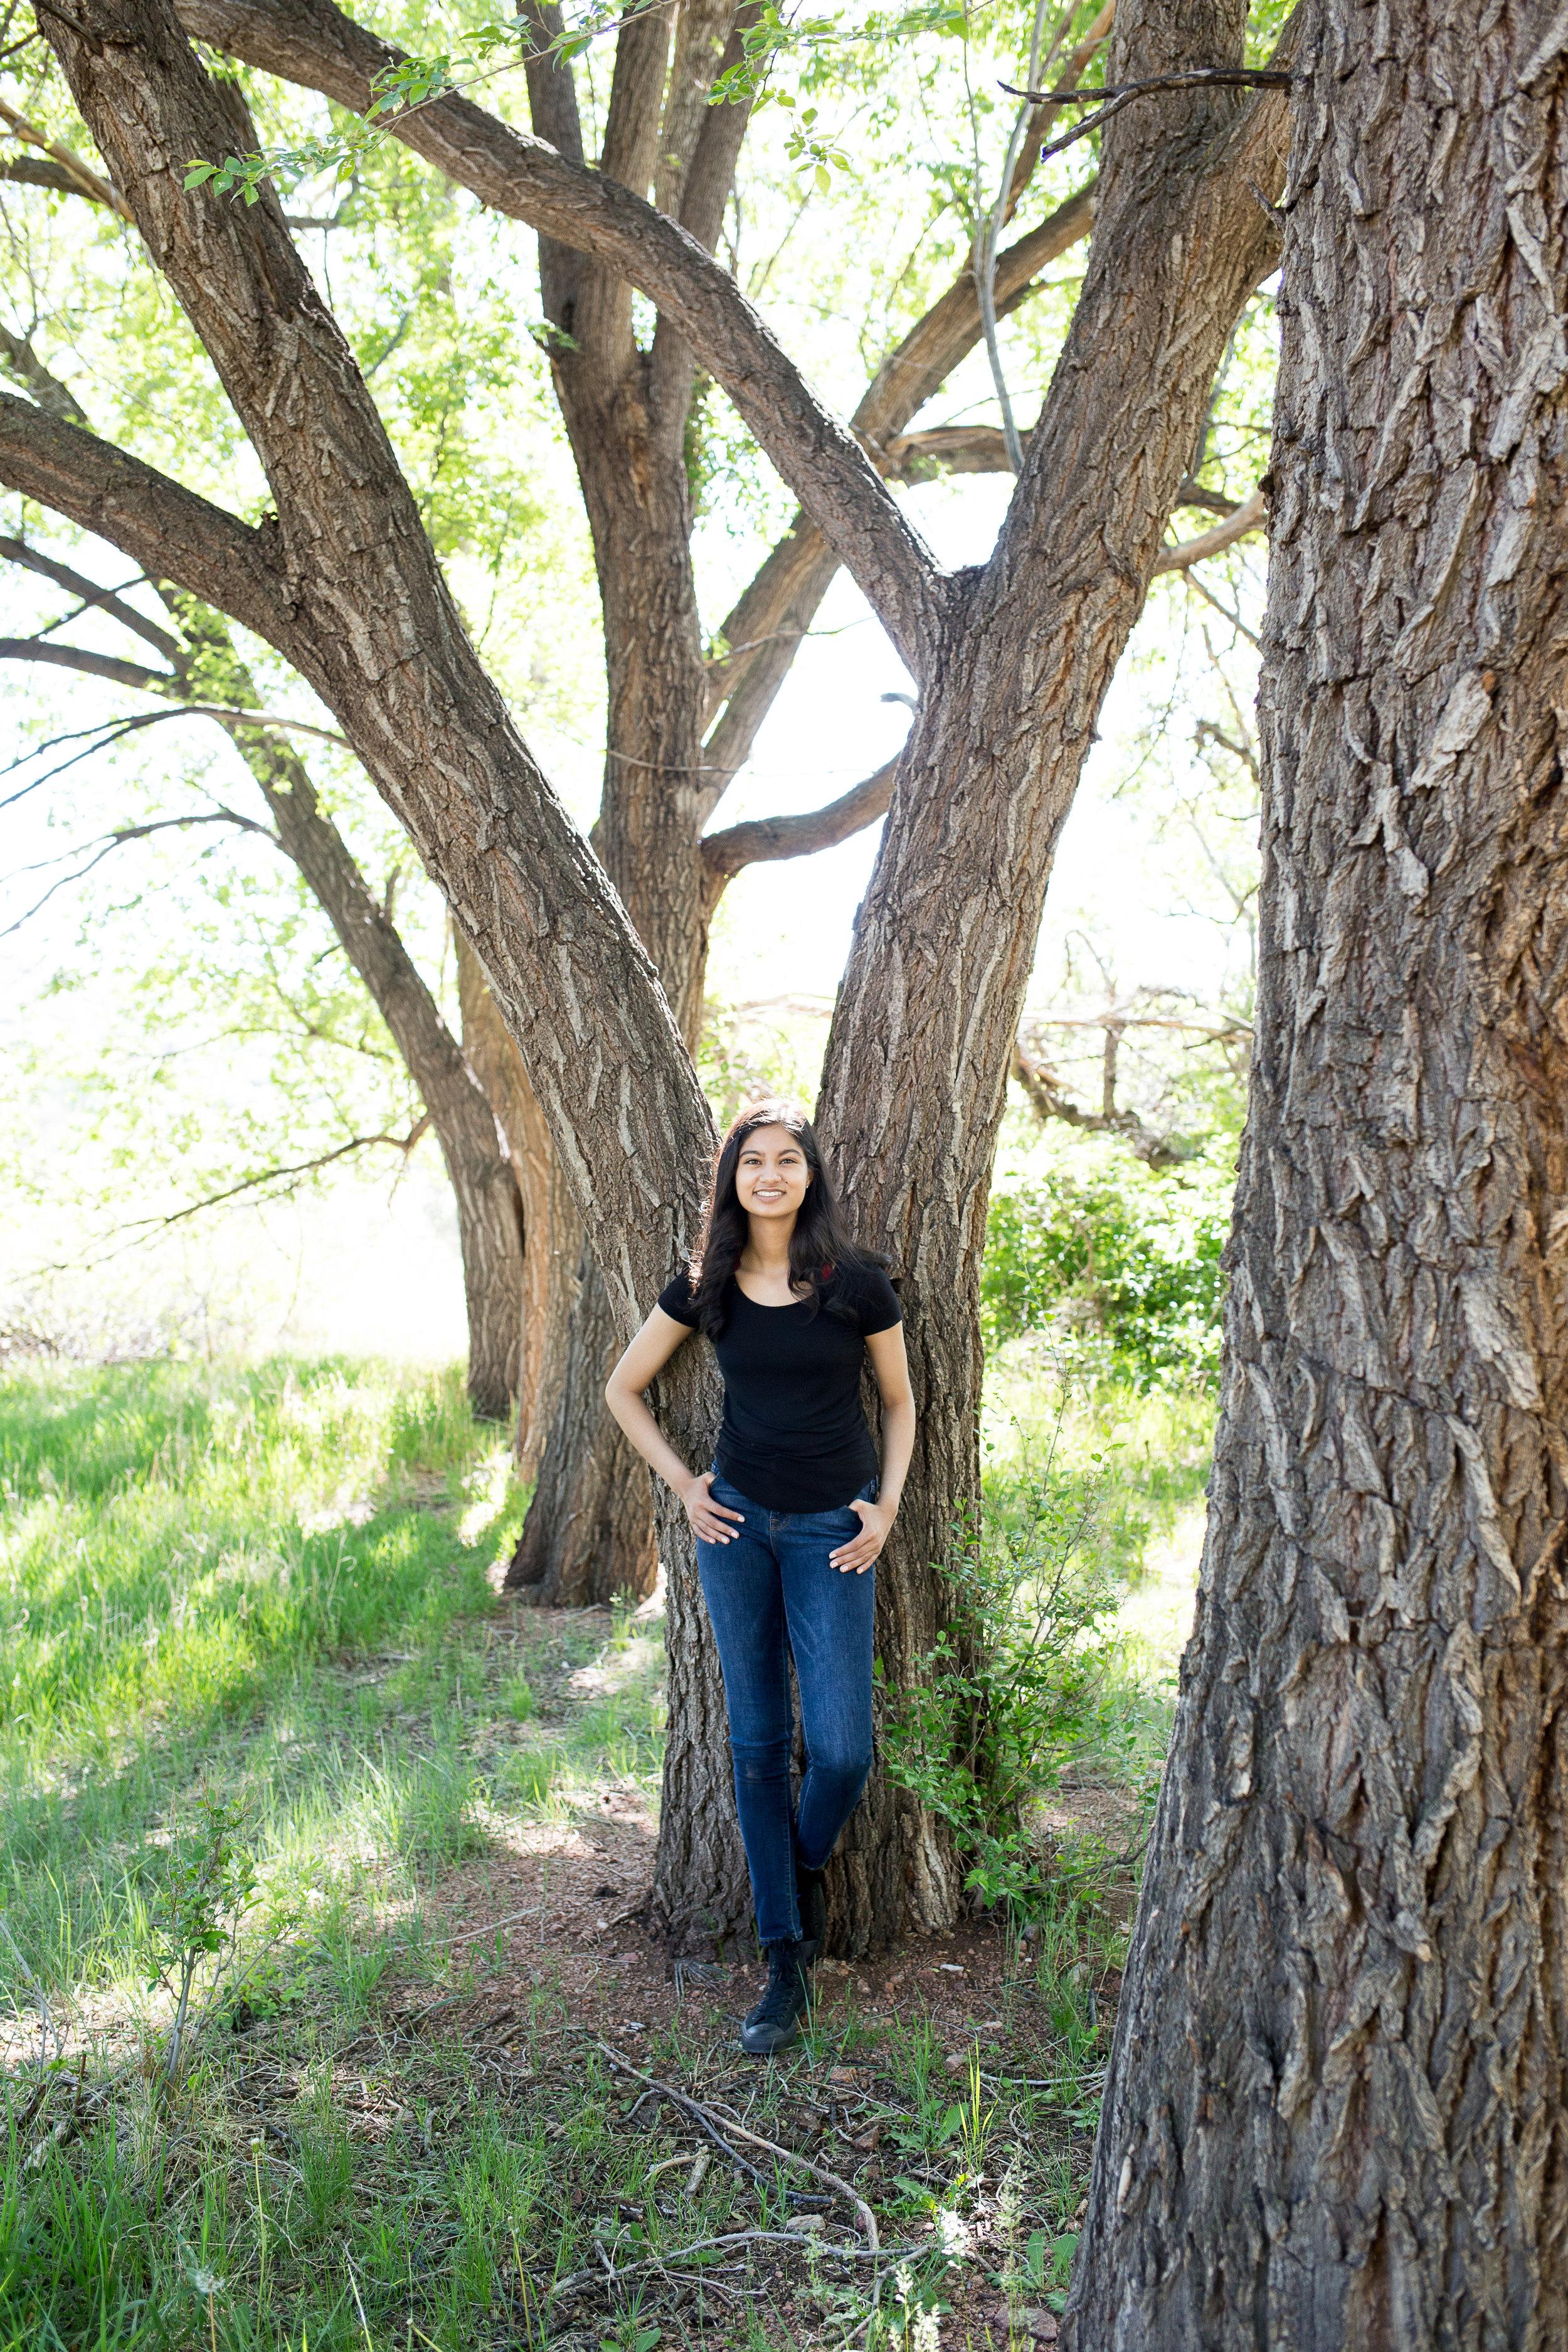 Colorado Springs Senior Photographer | Stacy Carosa Photography | Rock Ledge Ranch Senior Session | Colorado Springs Senior Portraits